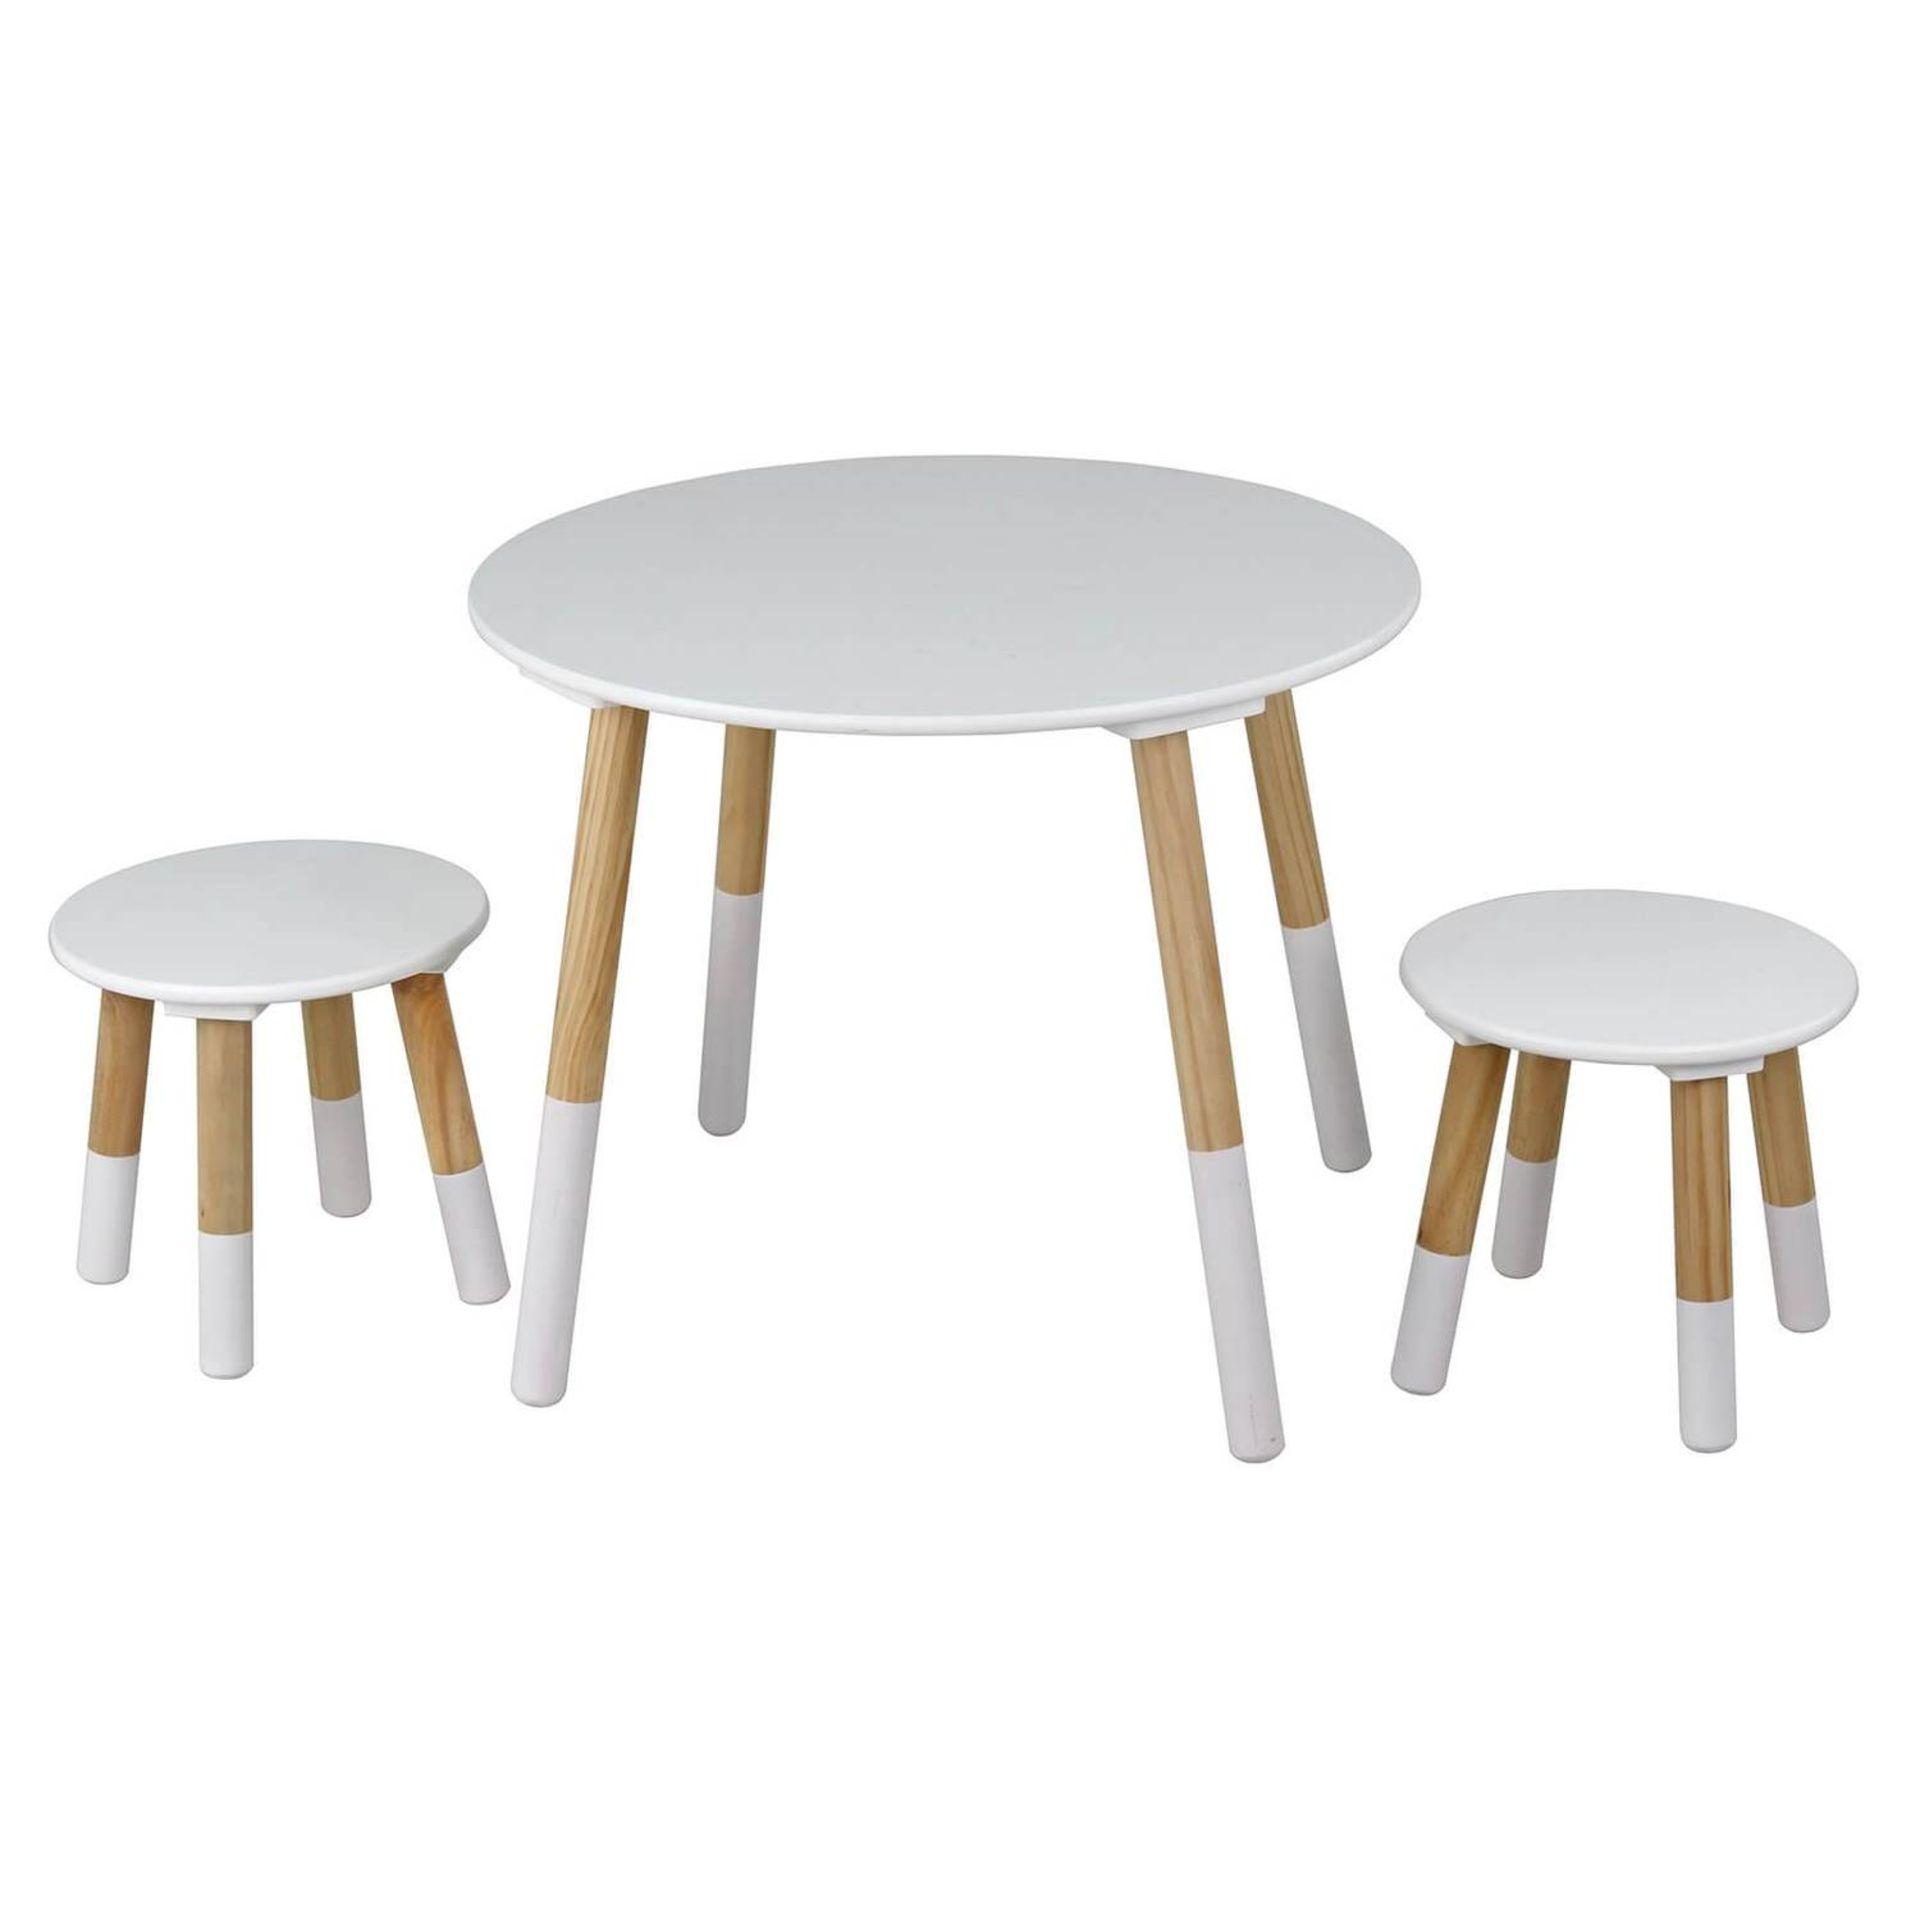 (P3) 1x Flexi Storage Kids Round Table With 2x Stools. White / Oak Finish. Table: H485x W595mm. S